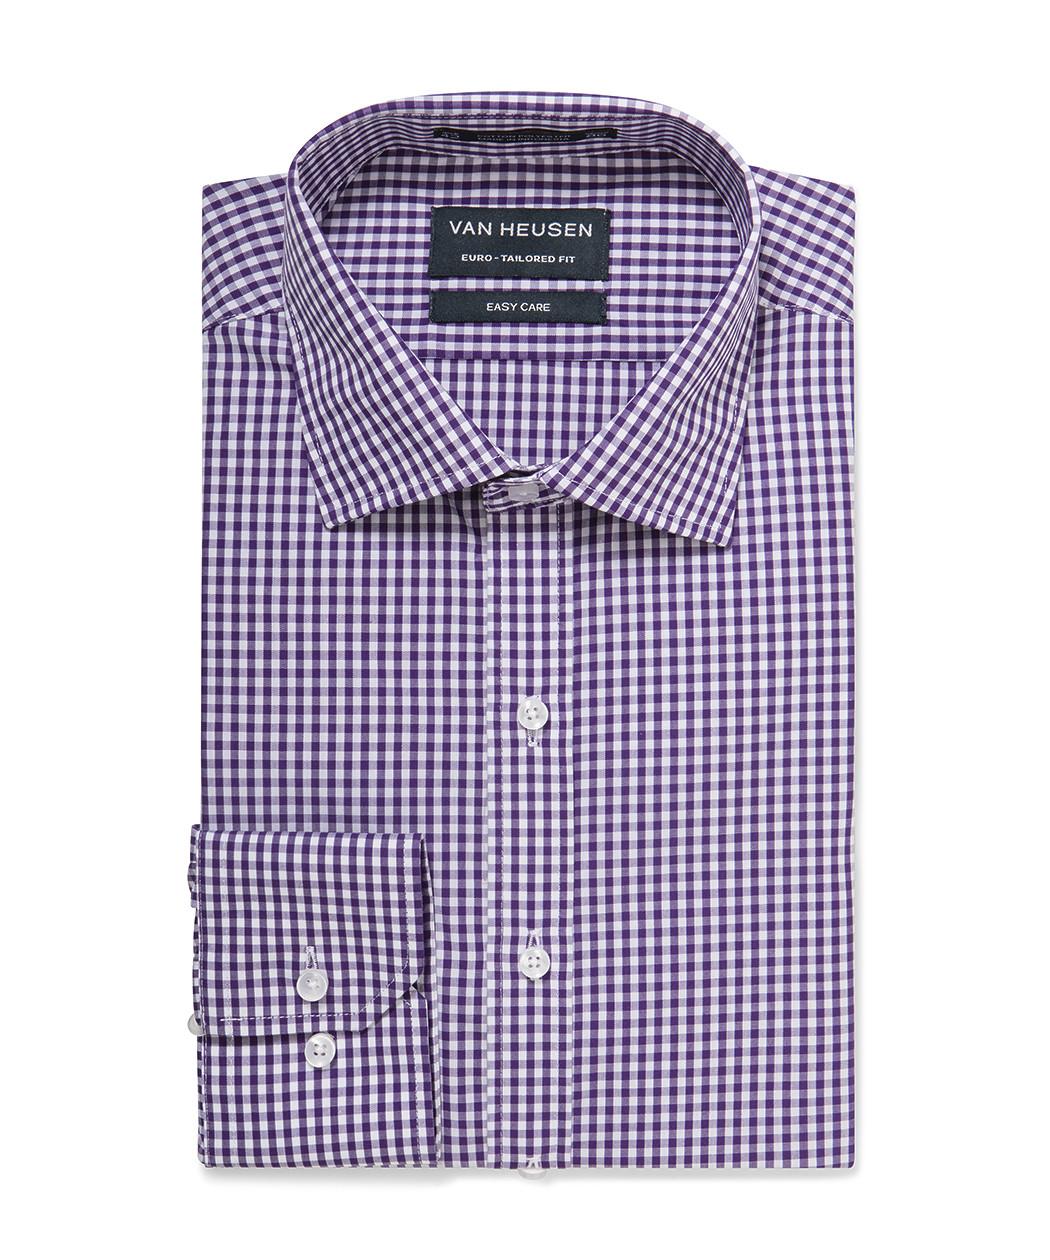 05c95e8c0b Euro Tailored Shirt Purple Small Gingham Check